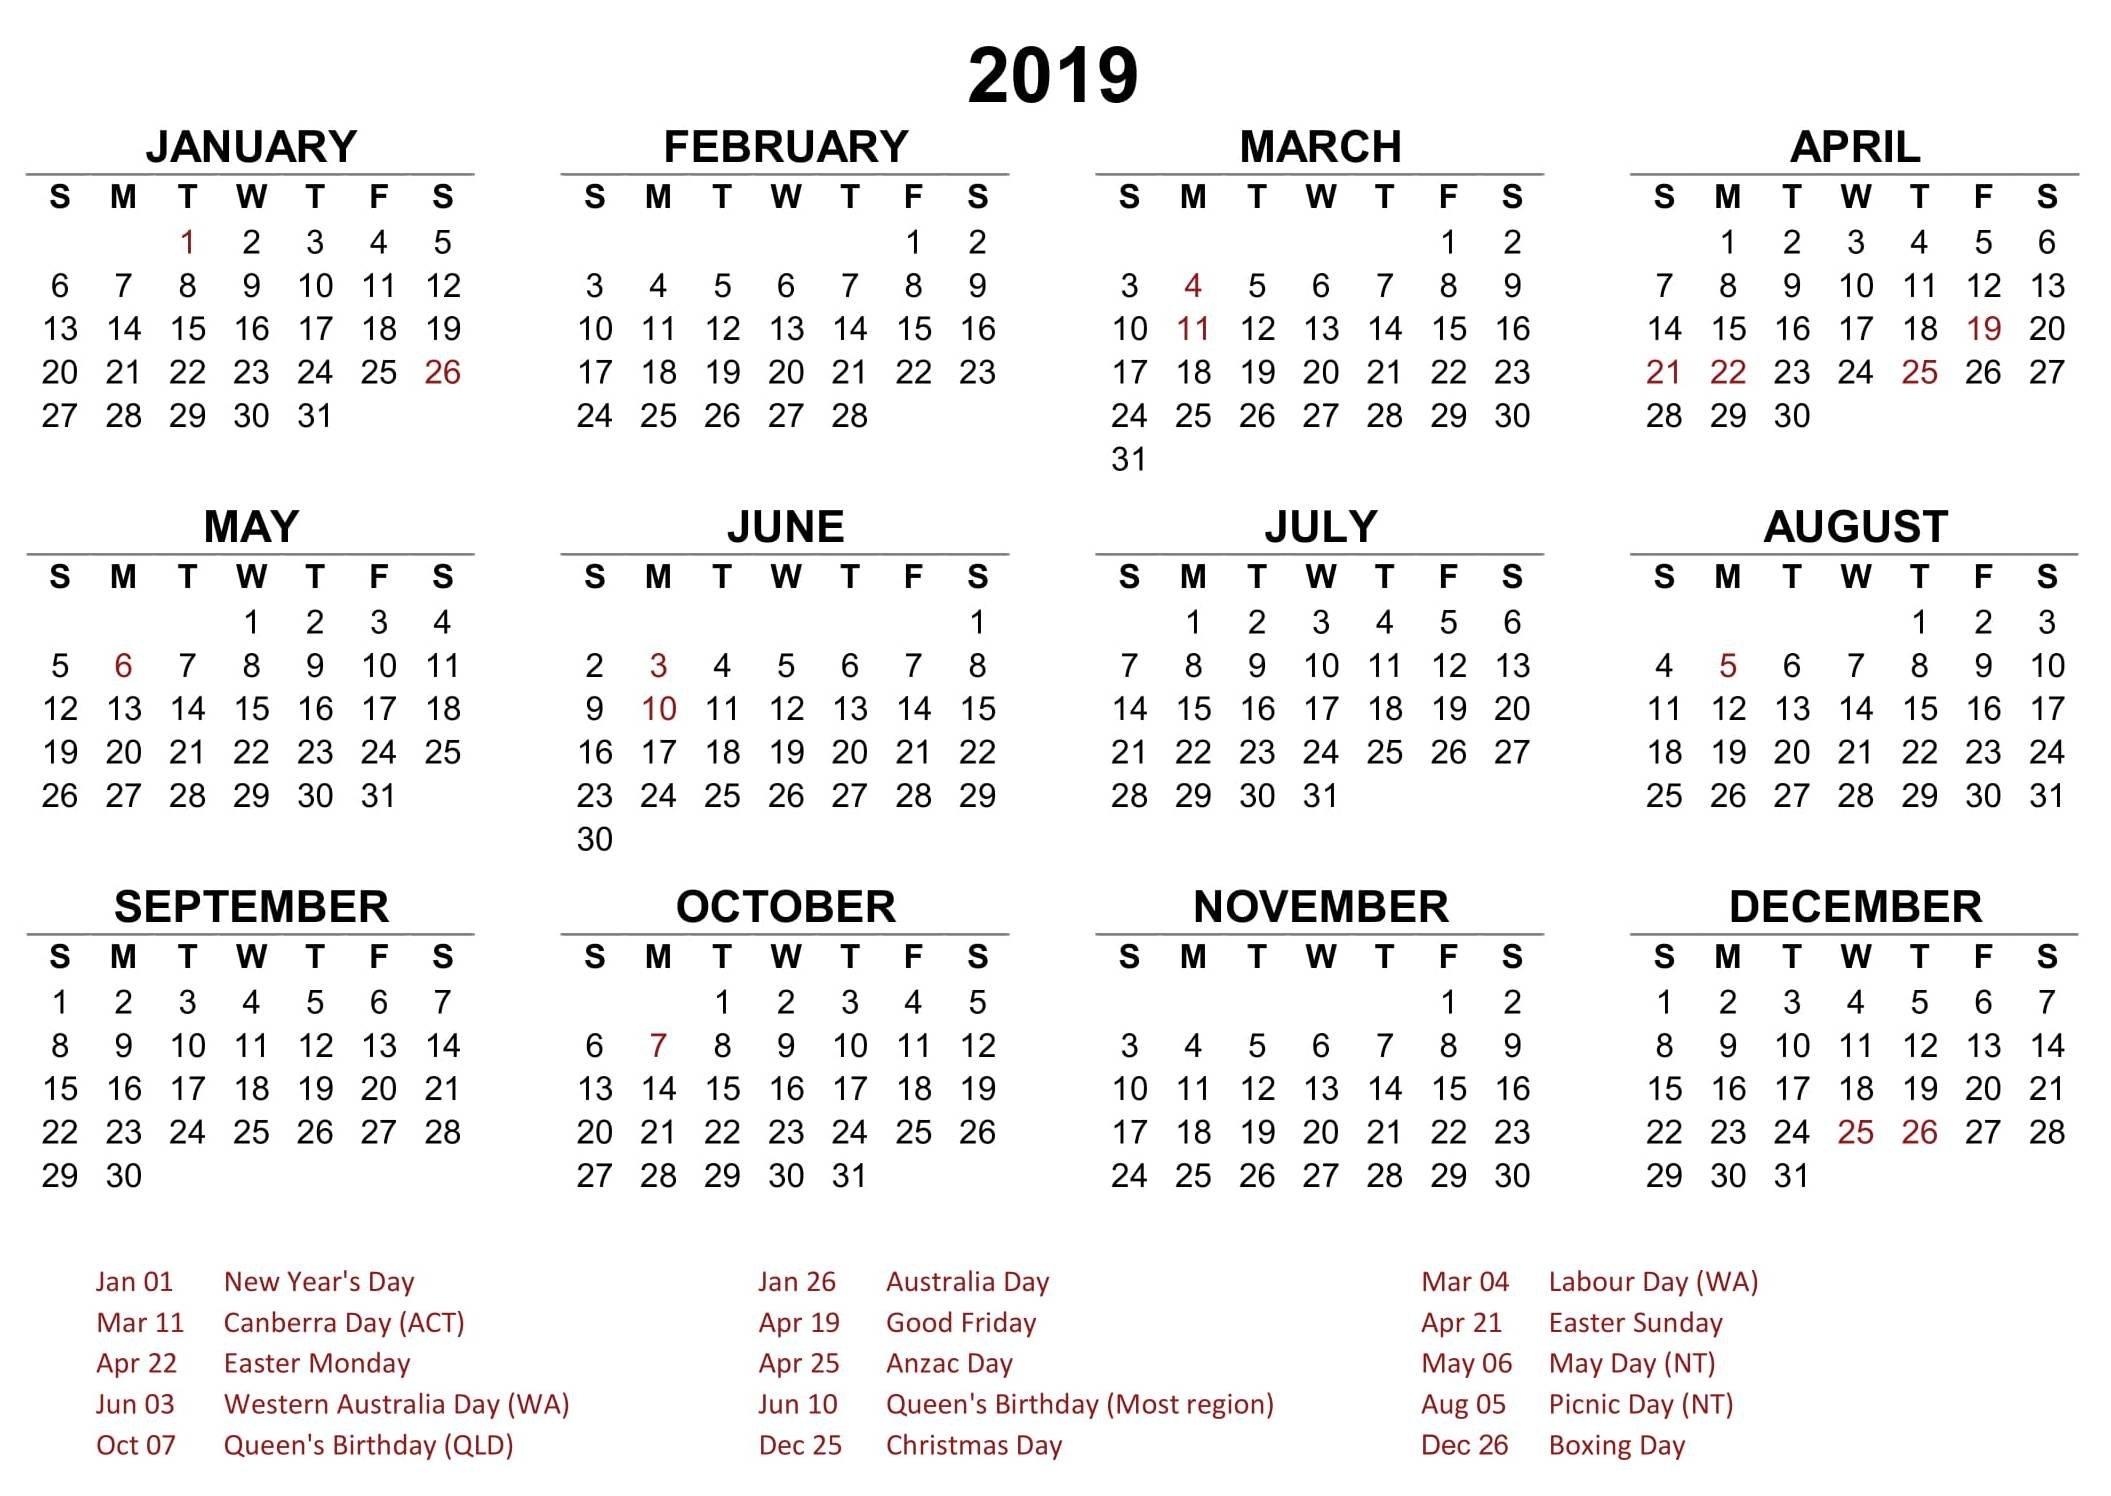 2018 19 Australia School Holidays. February 2019 Calendar. 2019 Calendar Year 2019 Australia